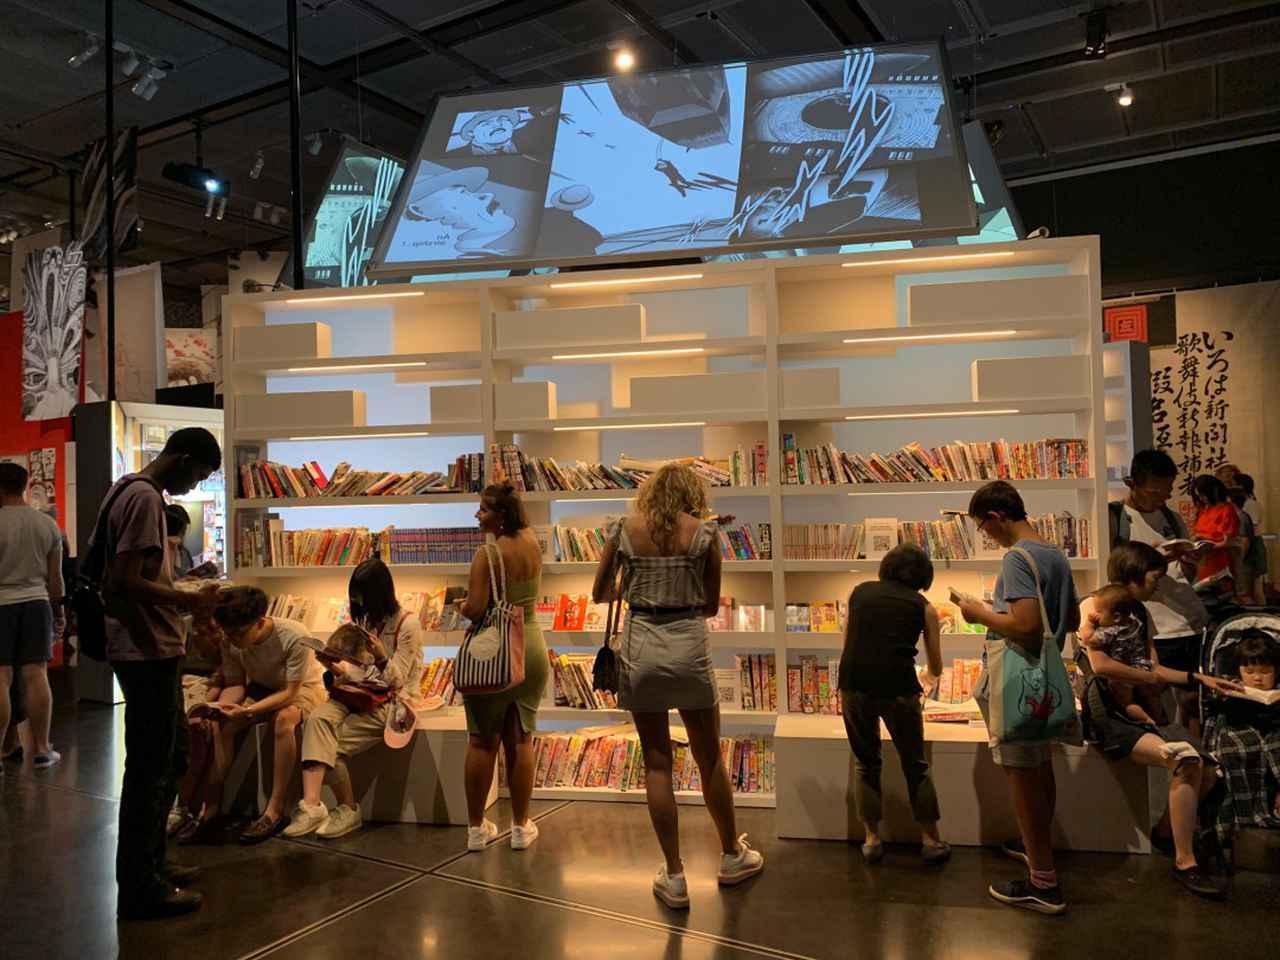 Images : 『The Citi exhibition Manga マンガ』